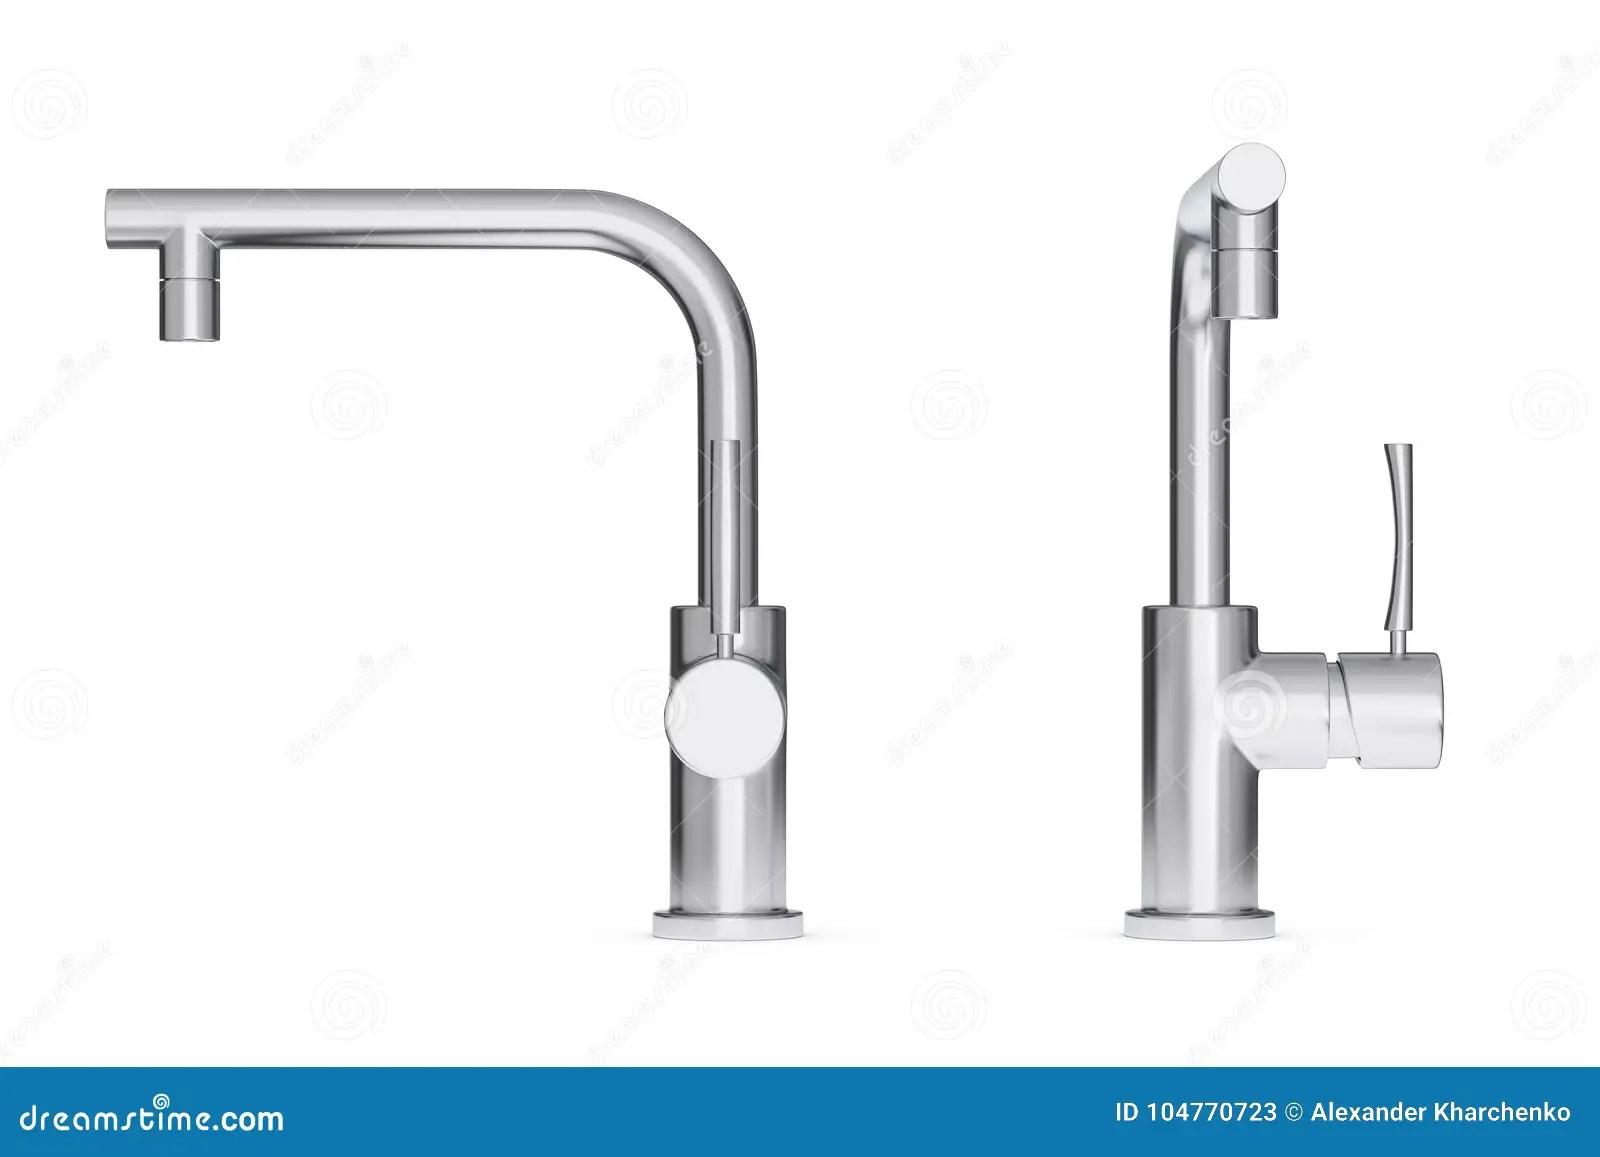 stainless steel kitchen faucets custom knives 现代不锈钢厨房水龙头 龙头3d翻译库存例证 插画包括有龙头 把柄 消防 在白色背景的龙头3d翻译